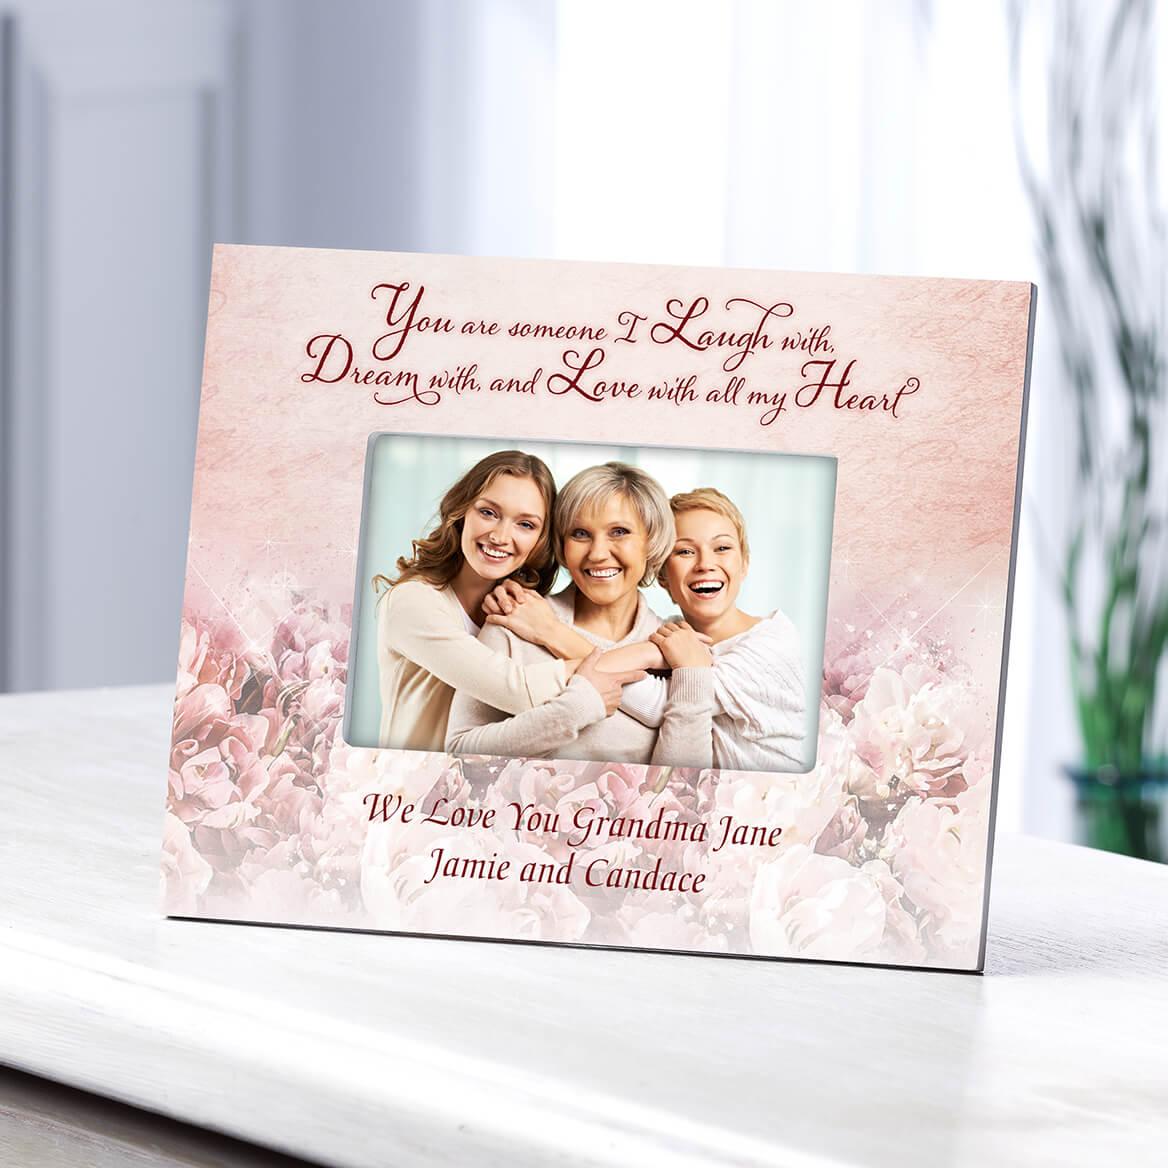 Personalized Laugh Dream & Love Frame-364641